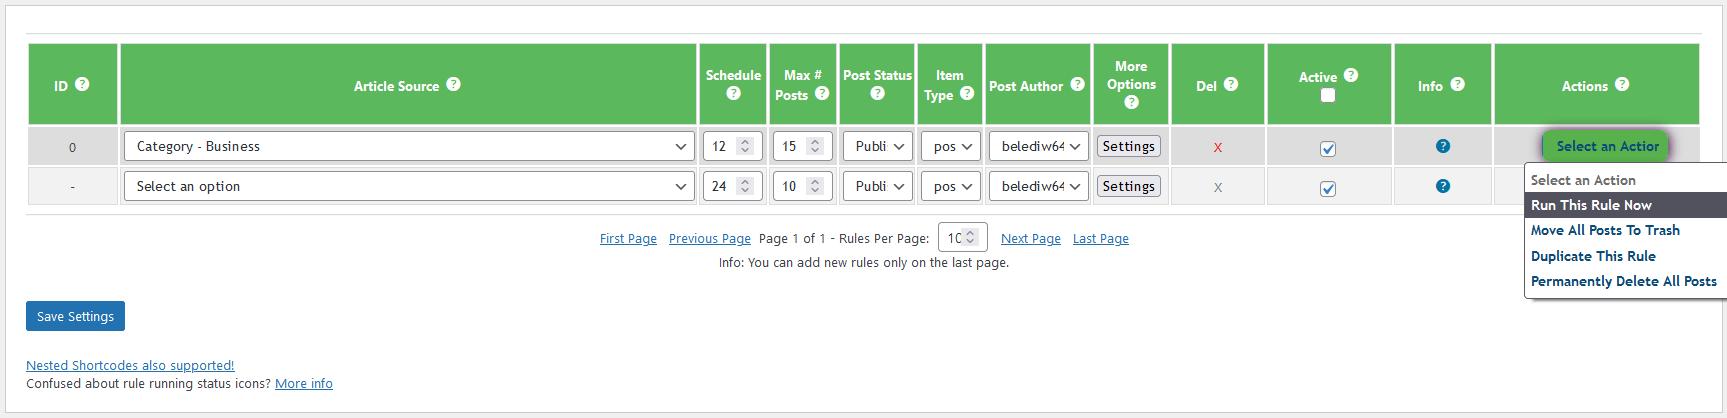 Add custom news posts - 10